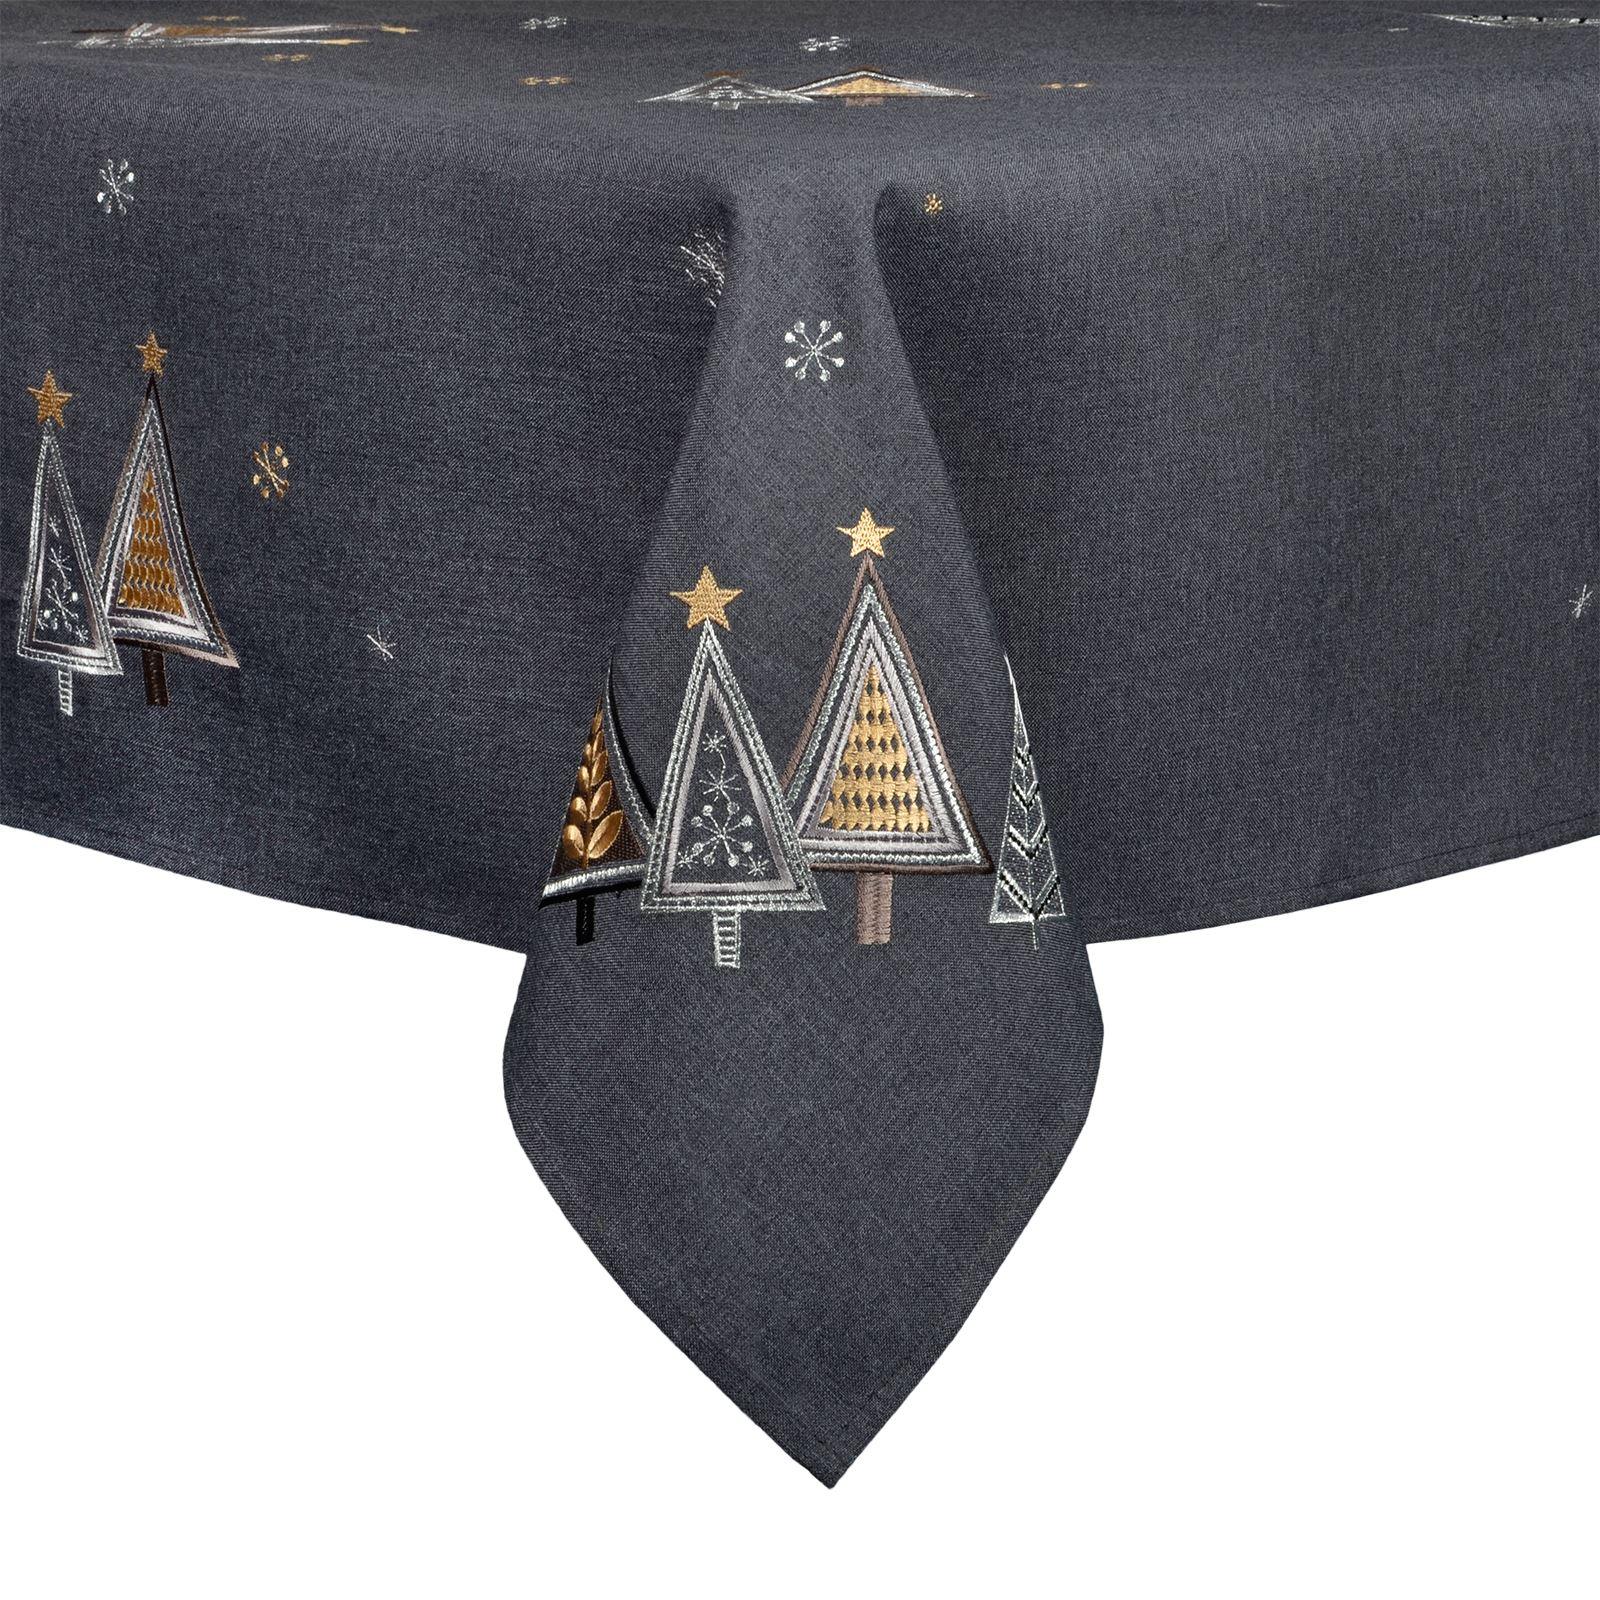 Christmas-Tablecloth-Festive-Pattern-Rectangle-Round-Fabric-Xmas-Room-Decoration Indexbild 16